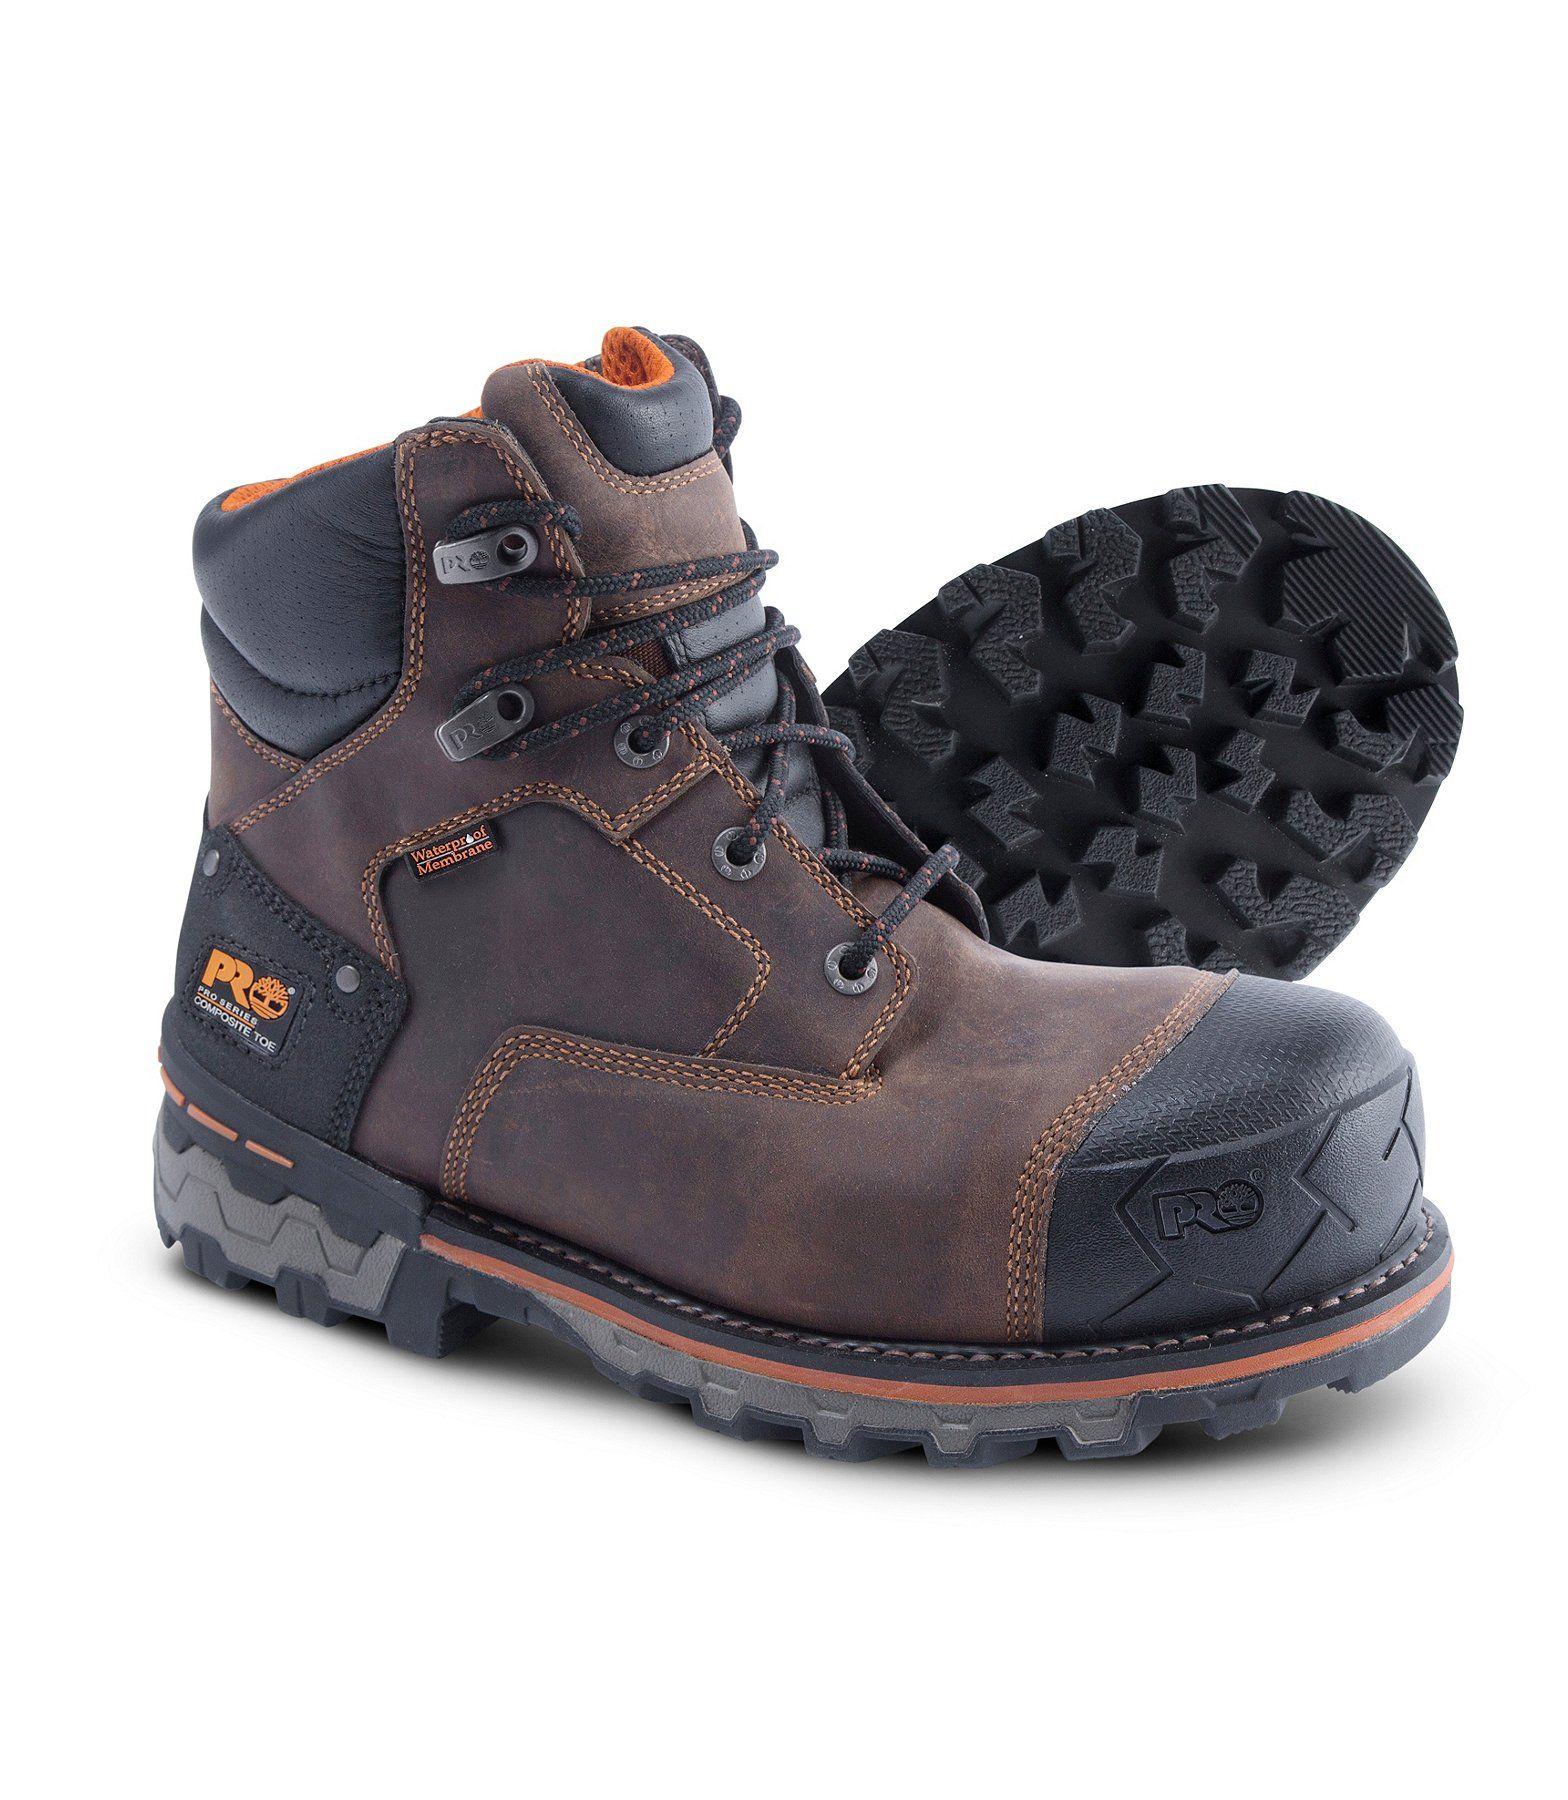 8b5f271ebe1 Mens 6'' Boondock Composite Toe Composite Plate Waterproof Work ...